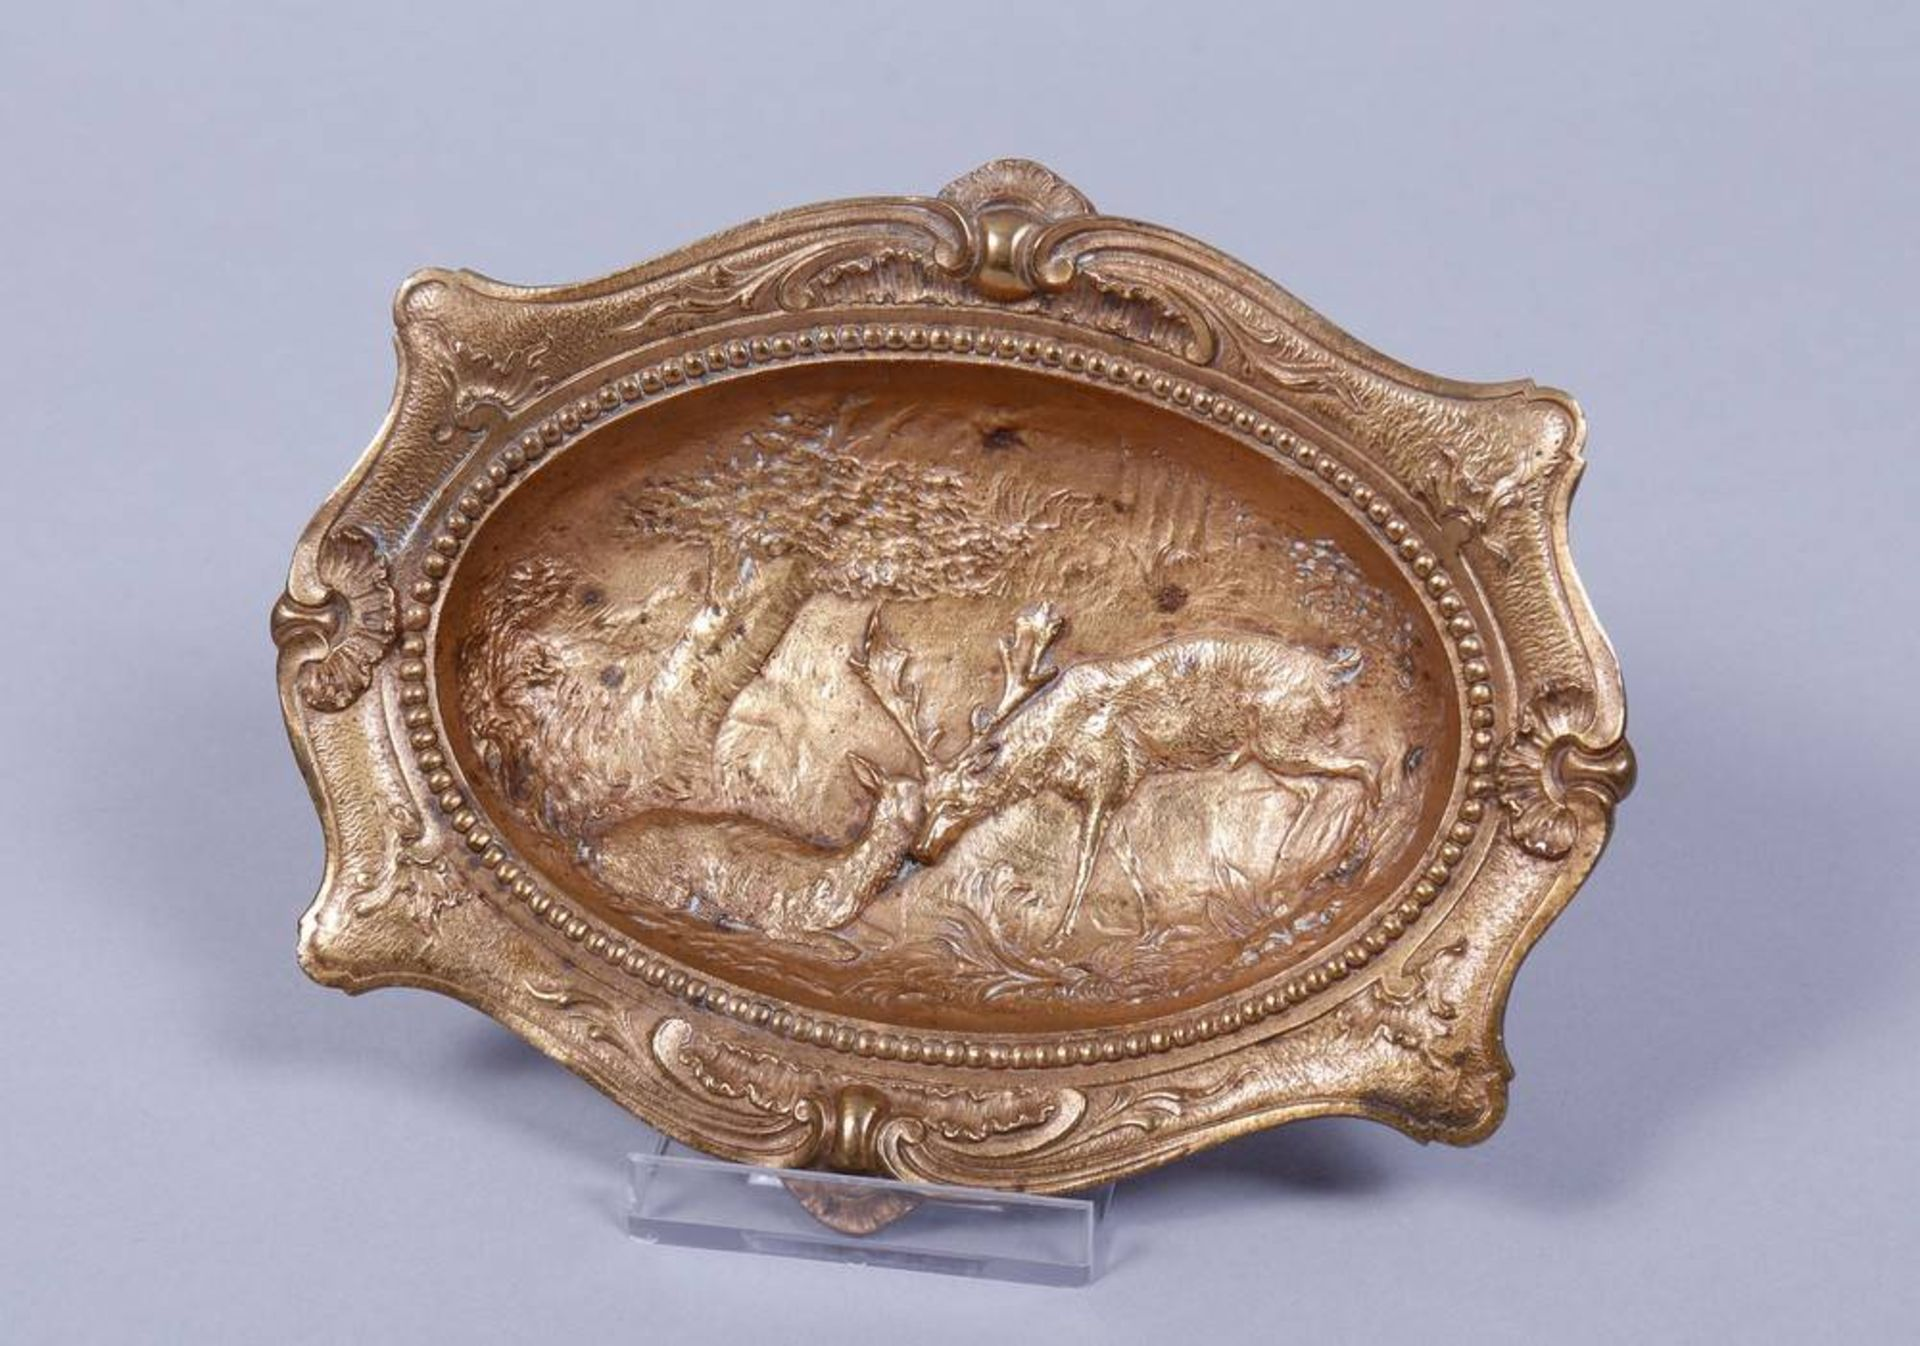 Visitenkarten-Schale, Bronze, vergoldet, wohl deutsch, um 1900